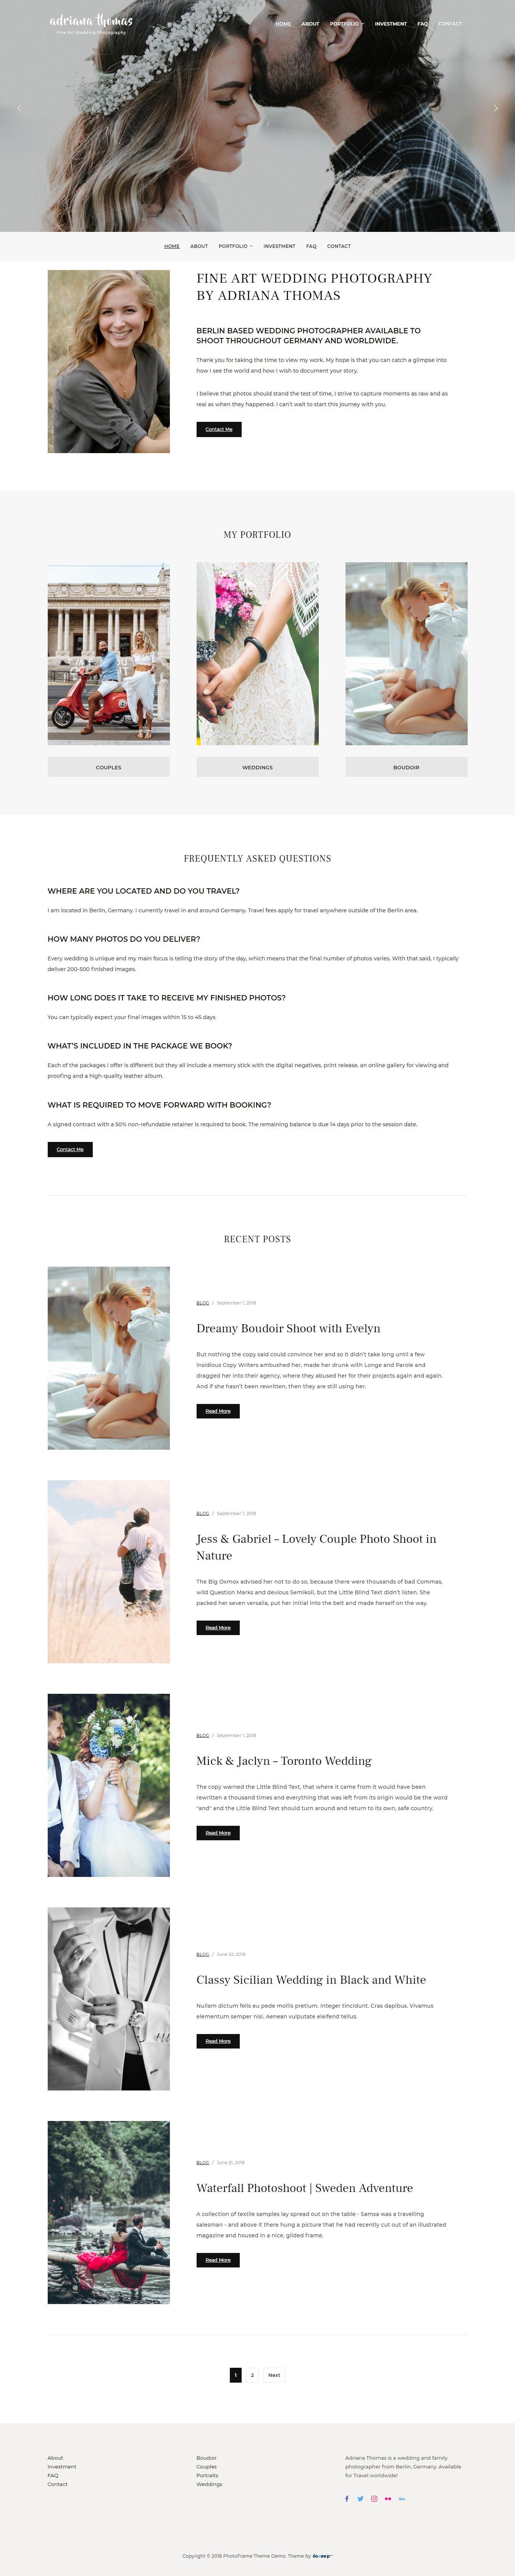 PhotoFrame - El mejor tema gratuito de WordPress para bodas